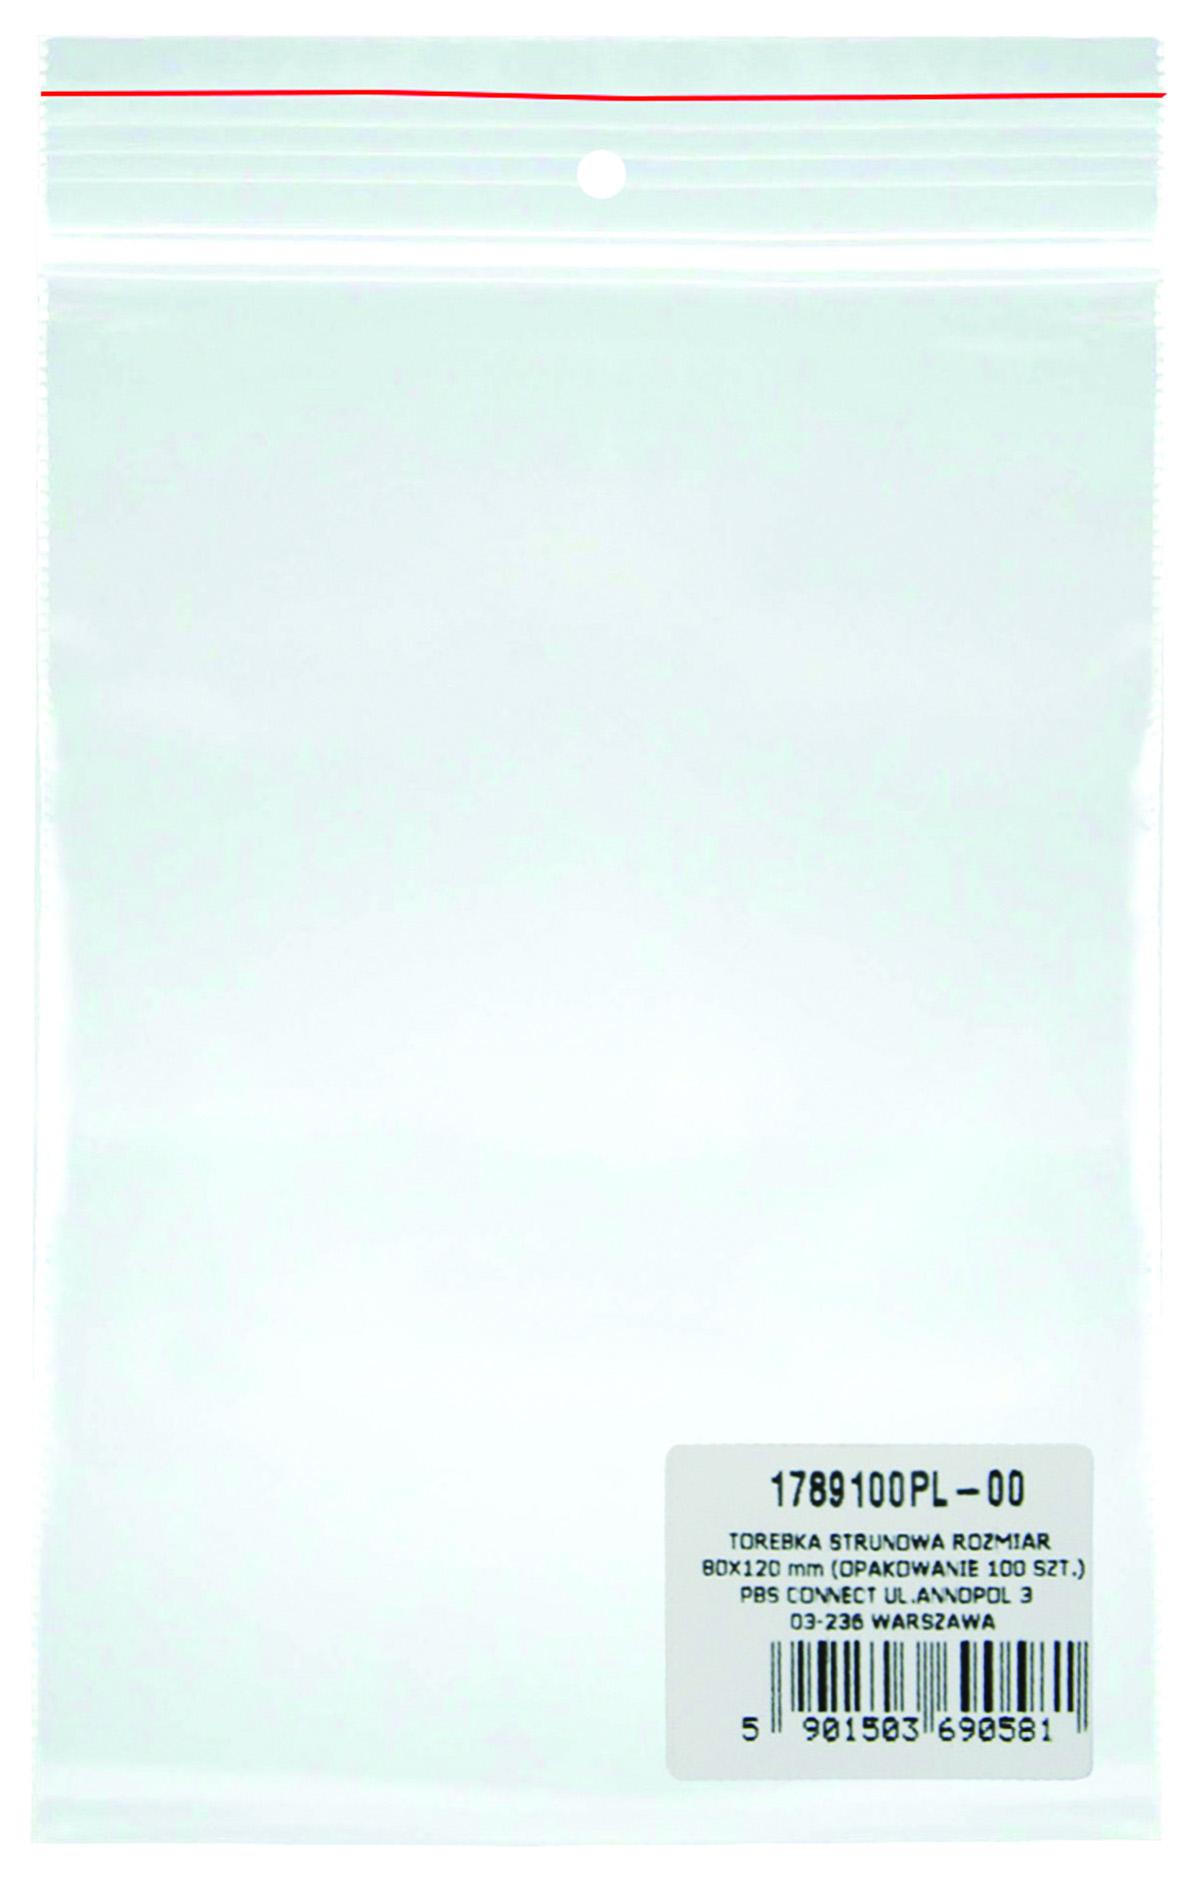 Pungi plastic cu fermoar pentru sigilare, 80 x 120 mm, 40 microni, 100 buc/set, DONAU -transparente